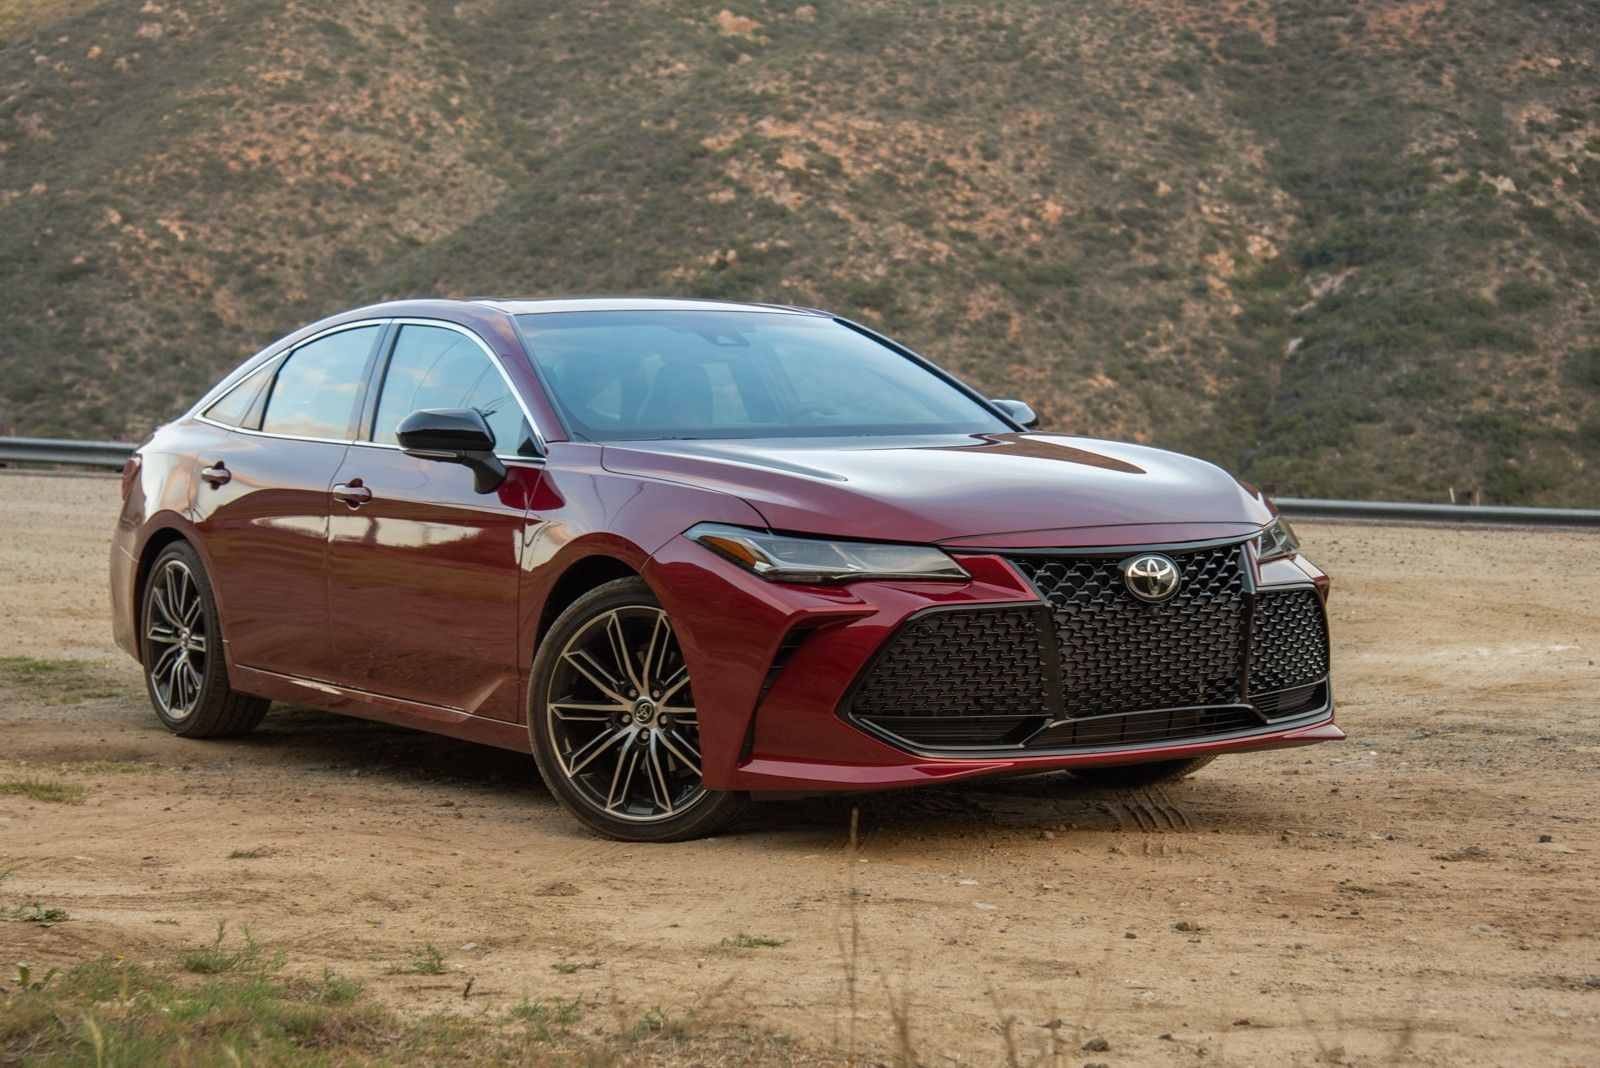 new 2019 toyota avalon test drive release date review car 2018 rh pinterest com